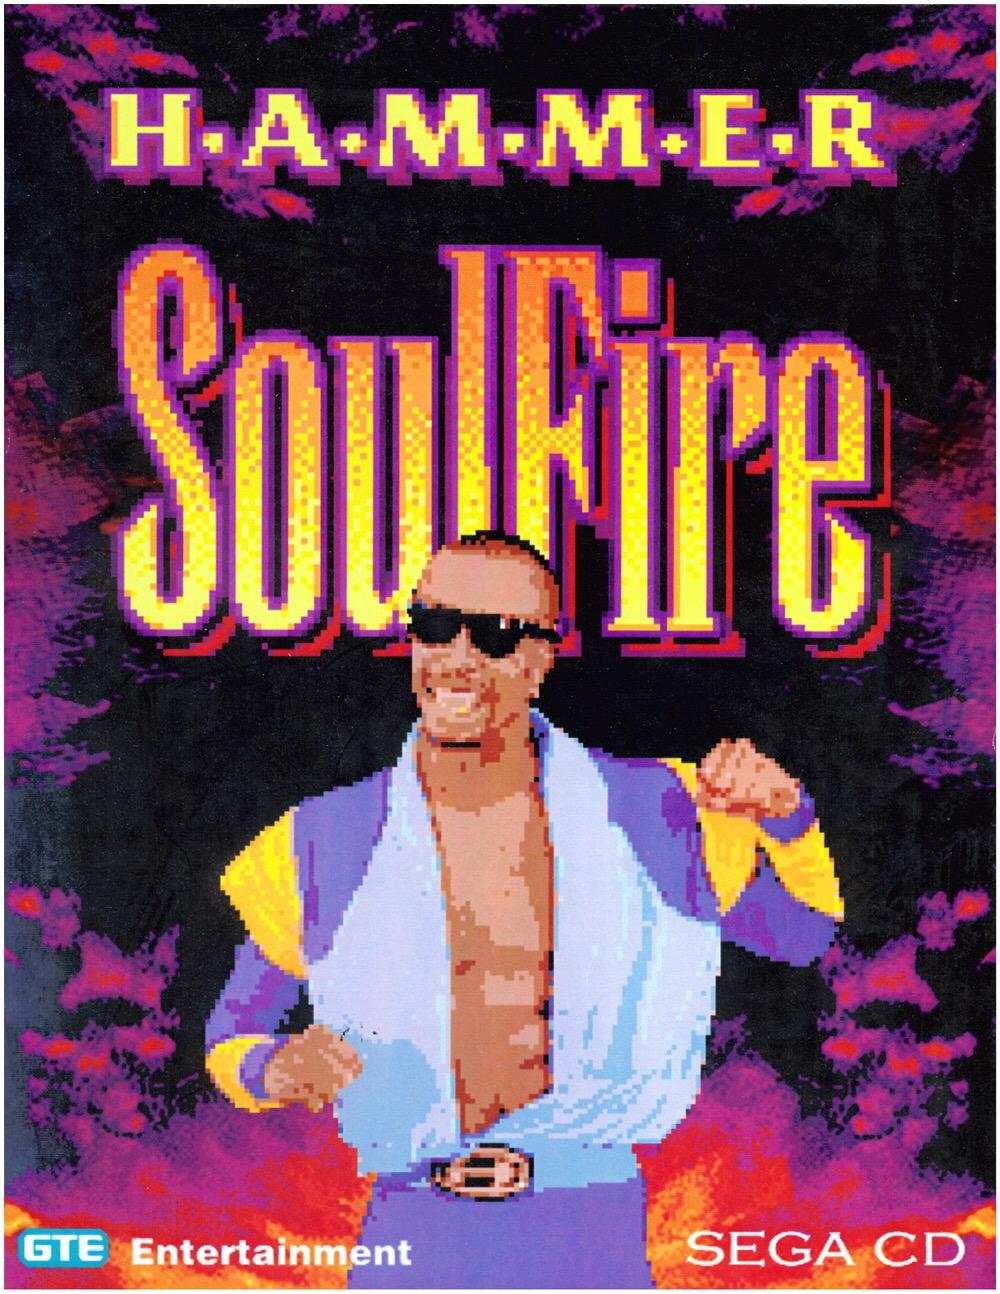 В 90-х рэпер MC Hammer разрабатывал игру, но сегодня U Can't Touch This - 2